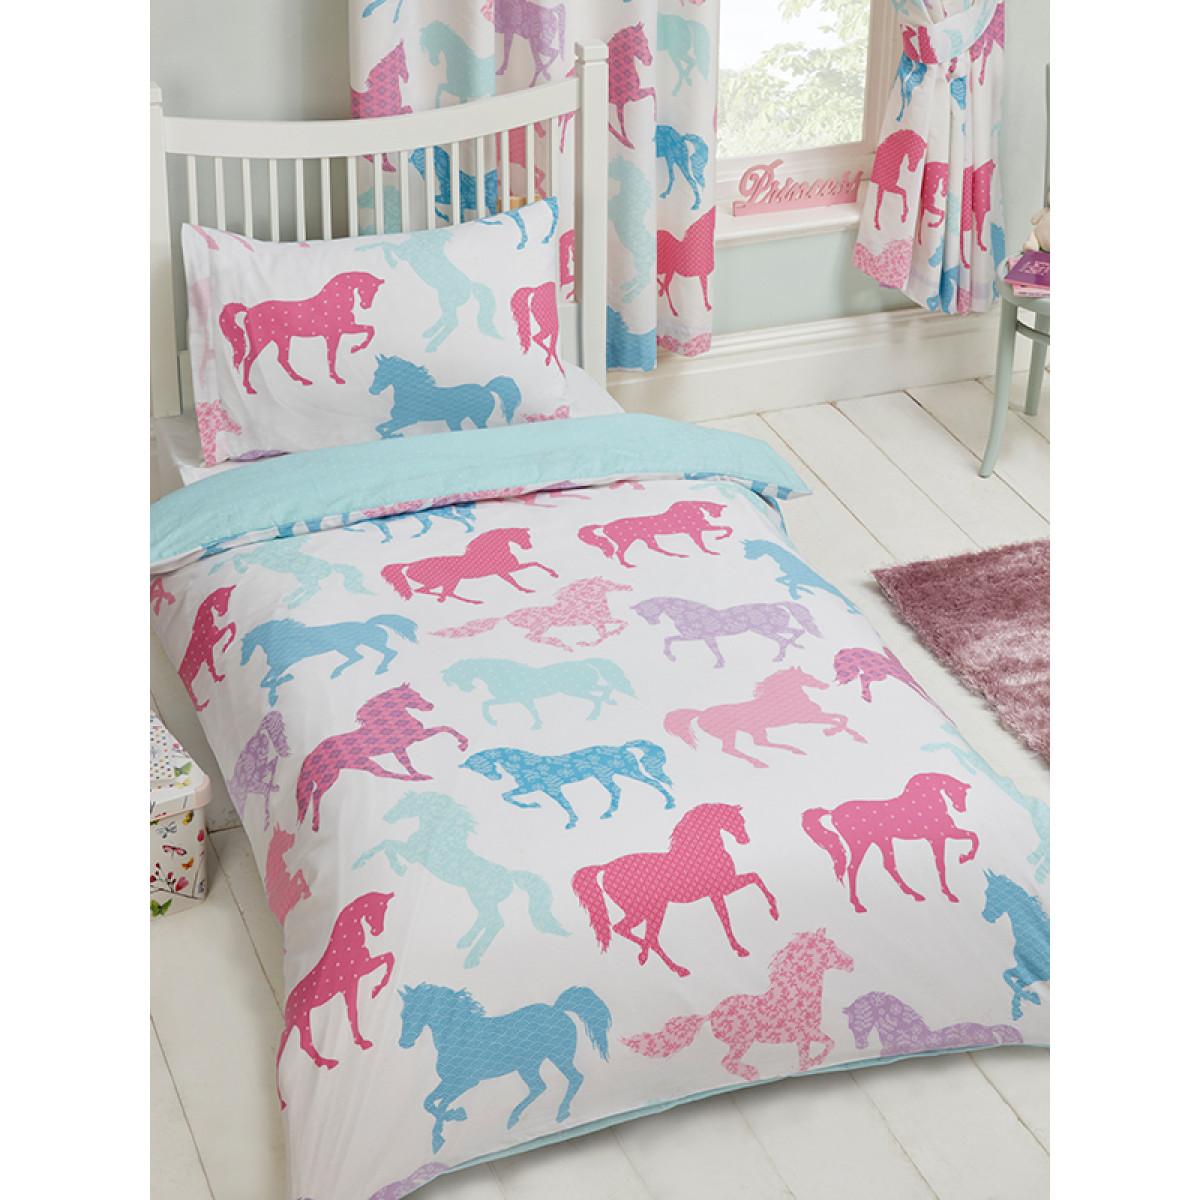 Patchwork Ponies Junior Duvet Cover And Pillowcase Set